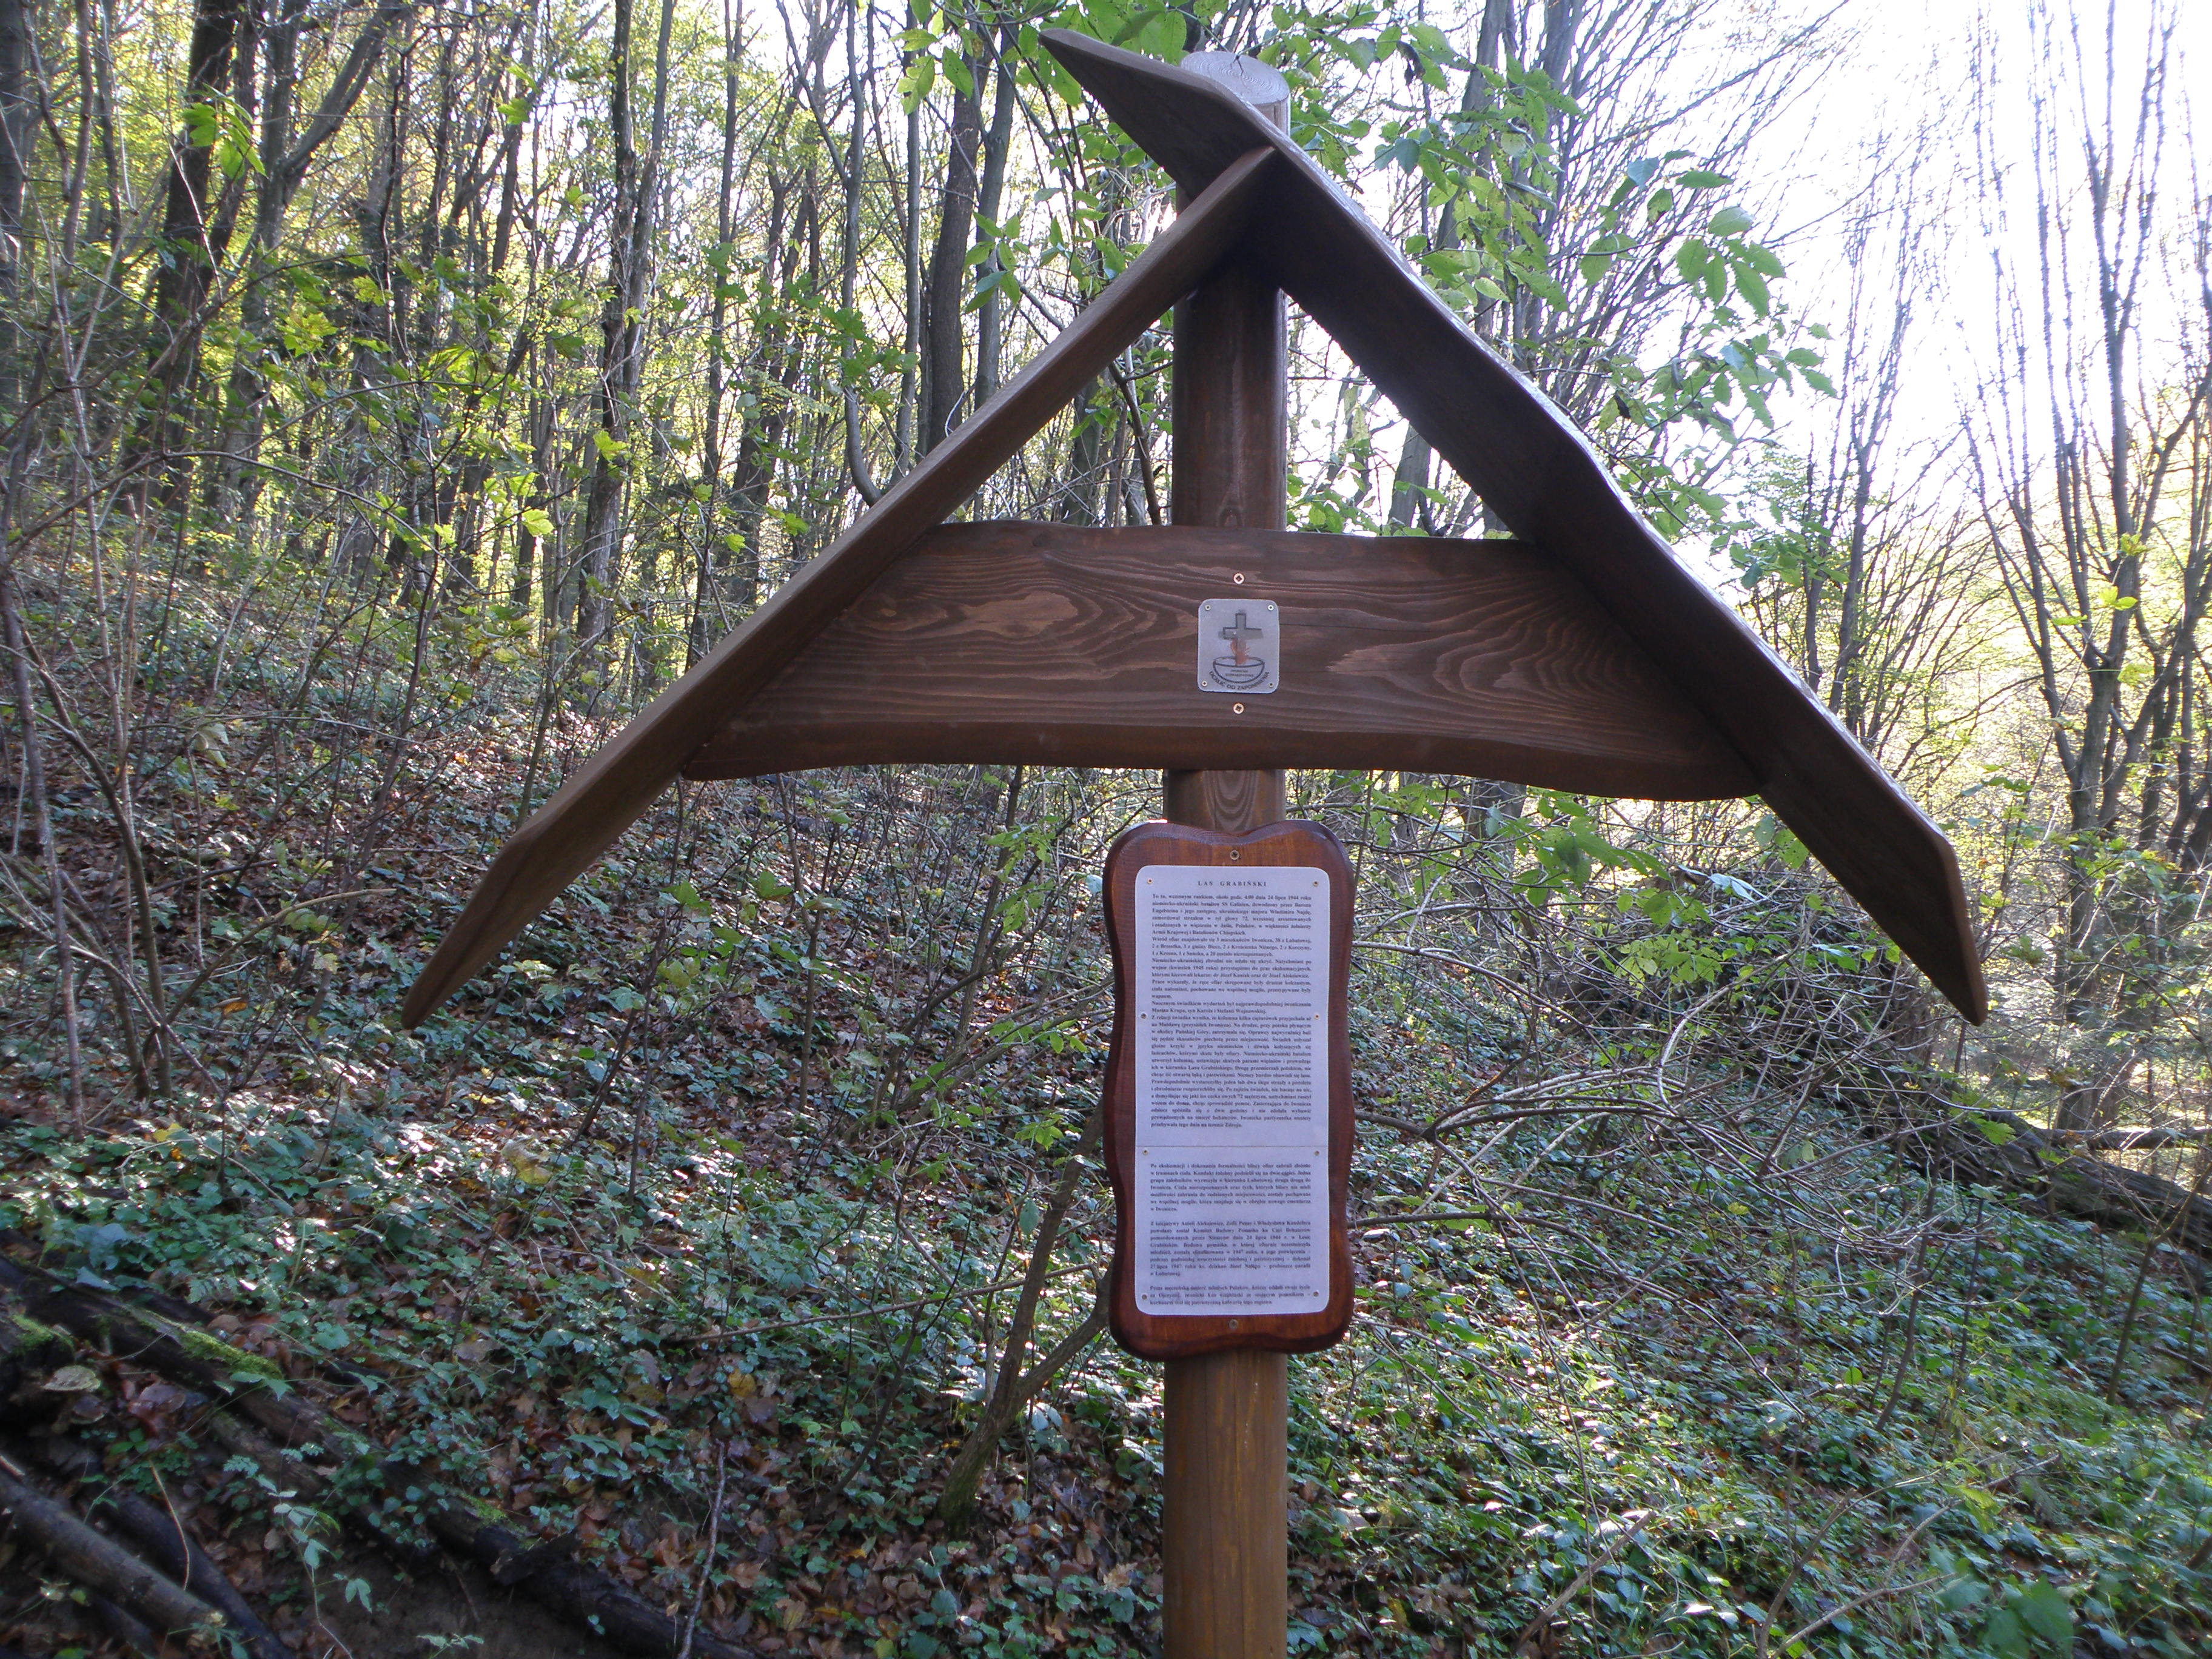 3.Pomnik w Lesie Grabińskim- 3